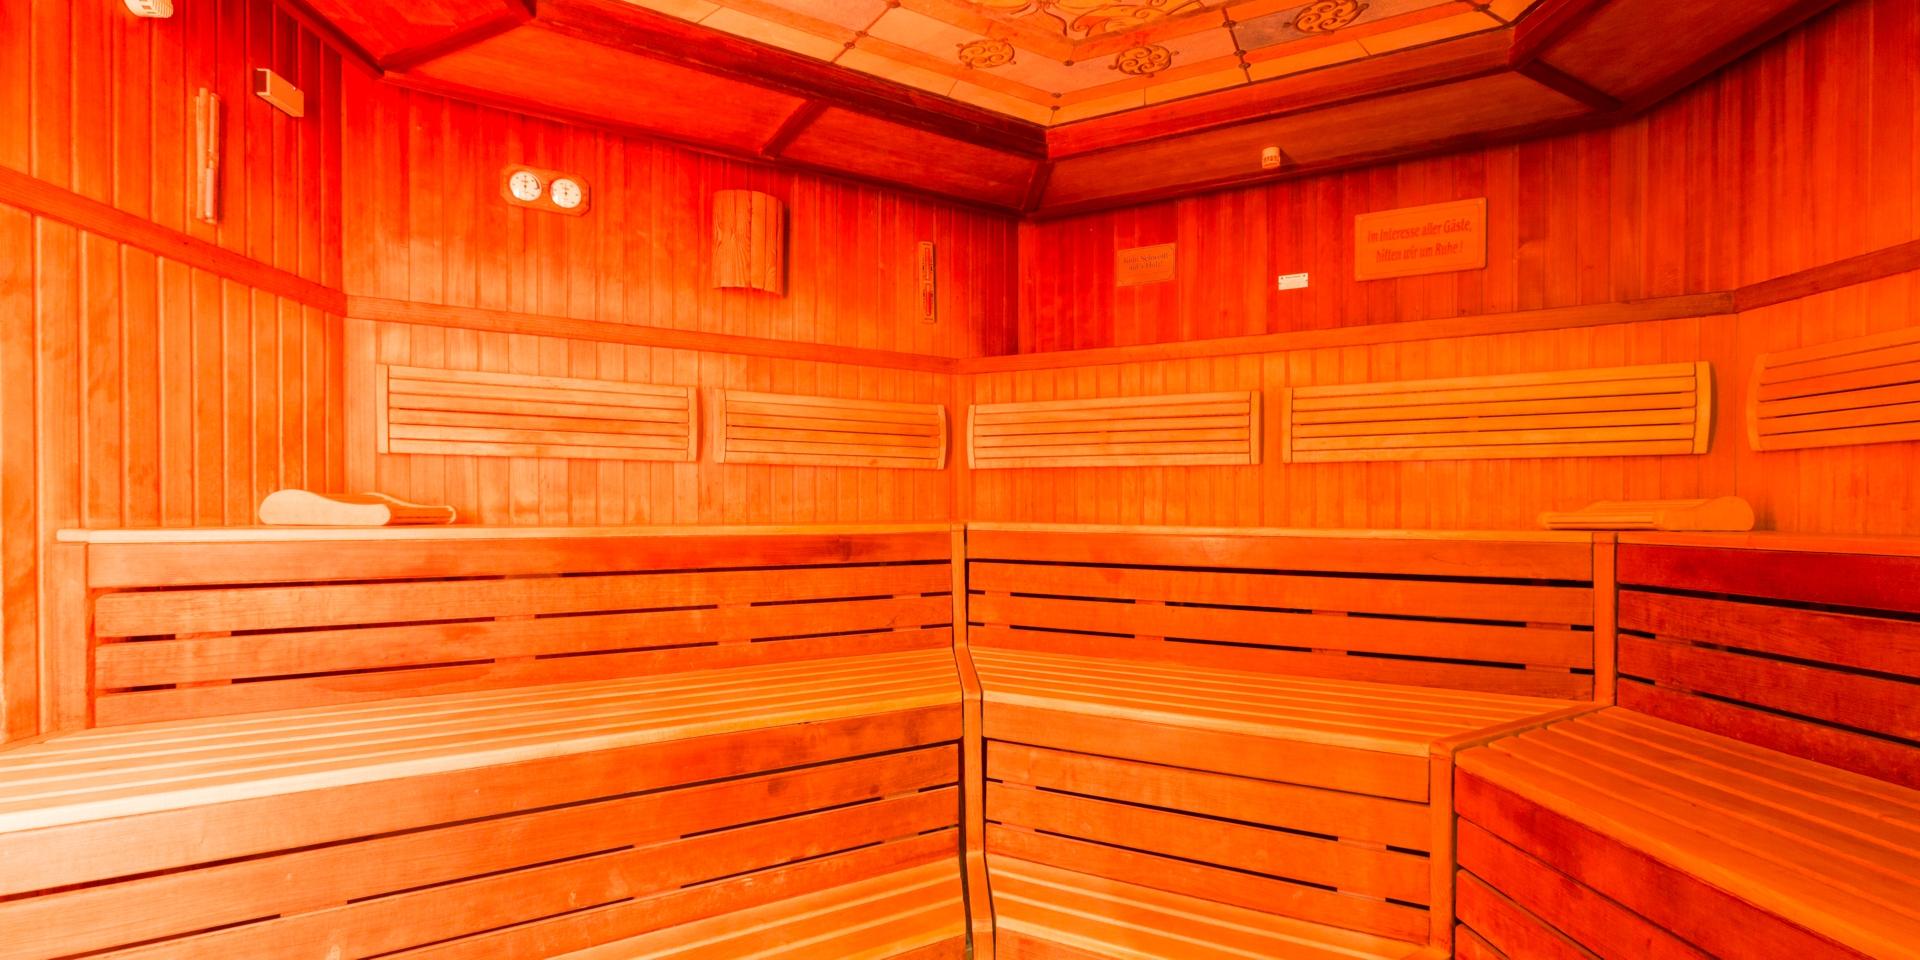 ficken in der sauna. Black Bedroom Furniture Sets. Home Design Ideas